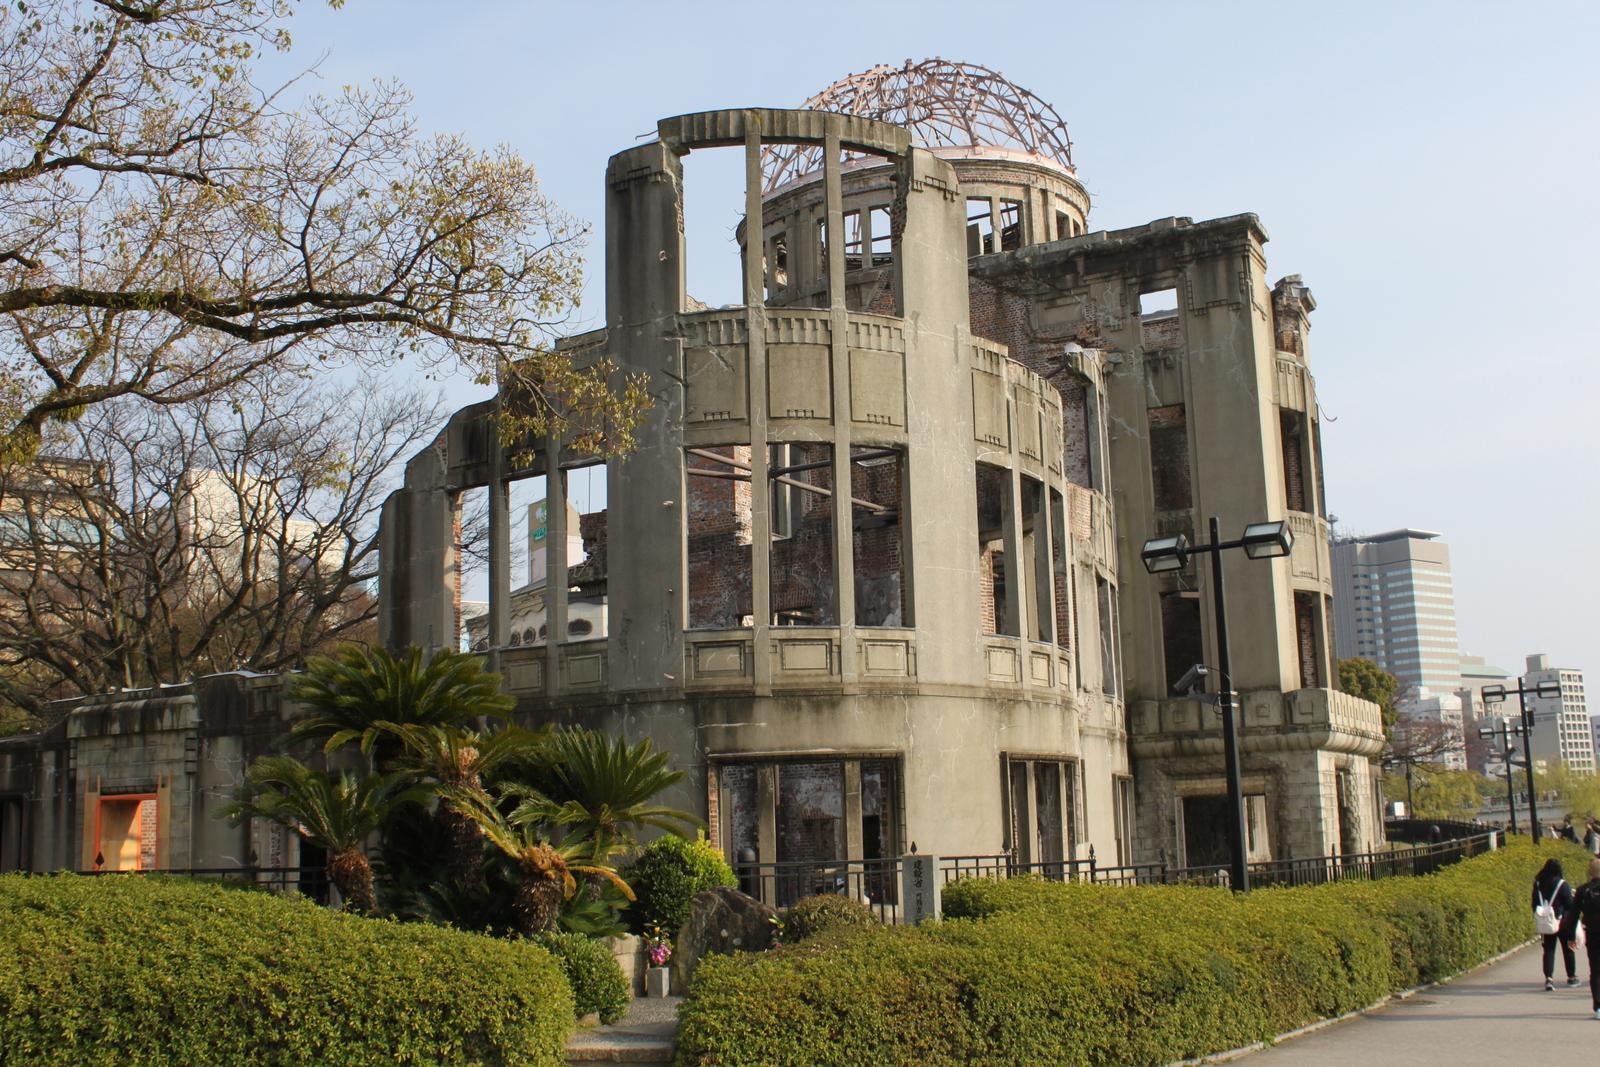 Atombombendom in Hiroshima